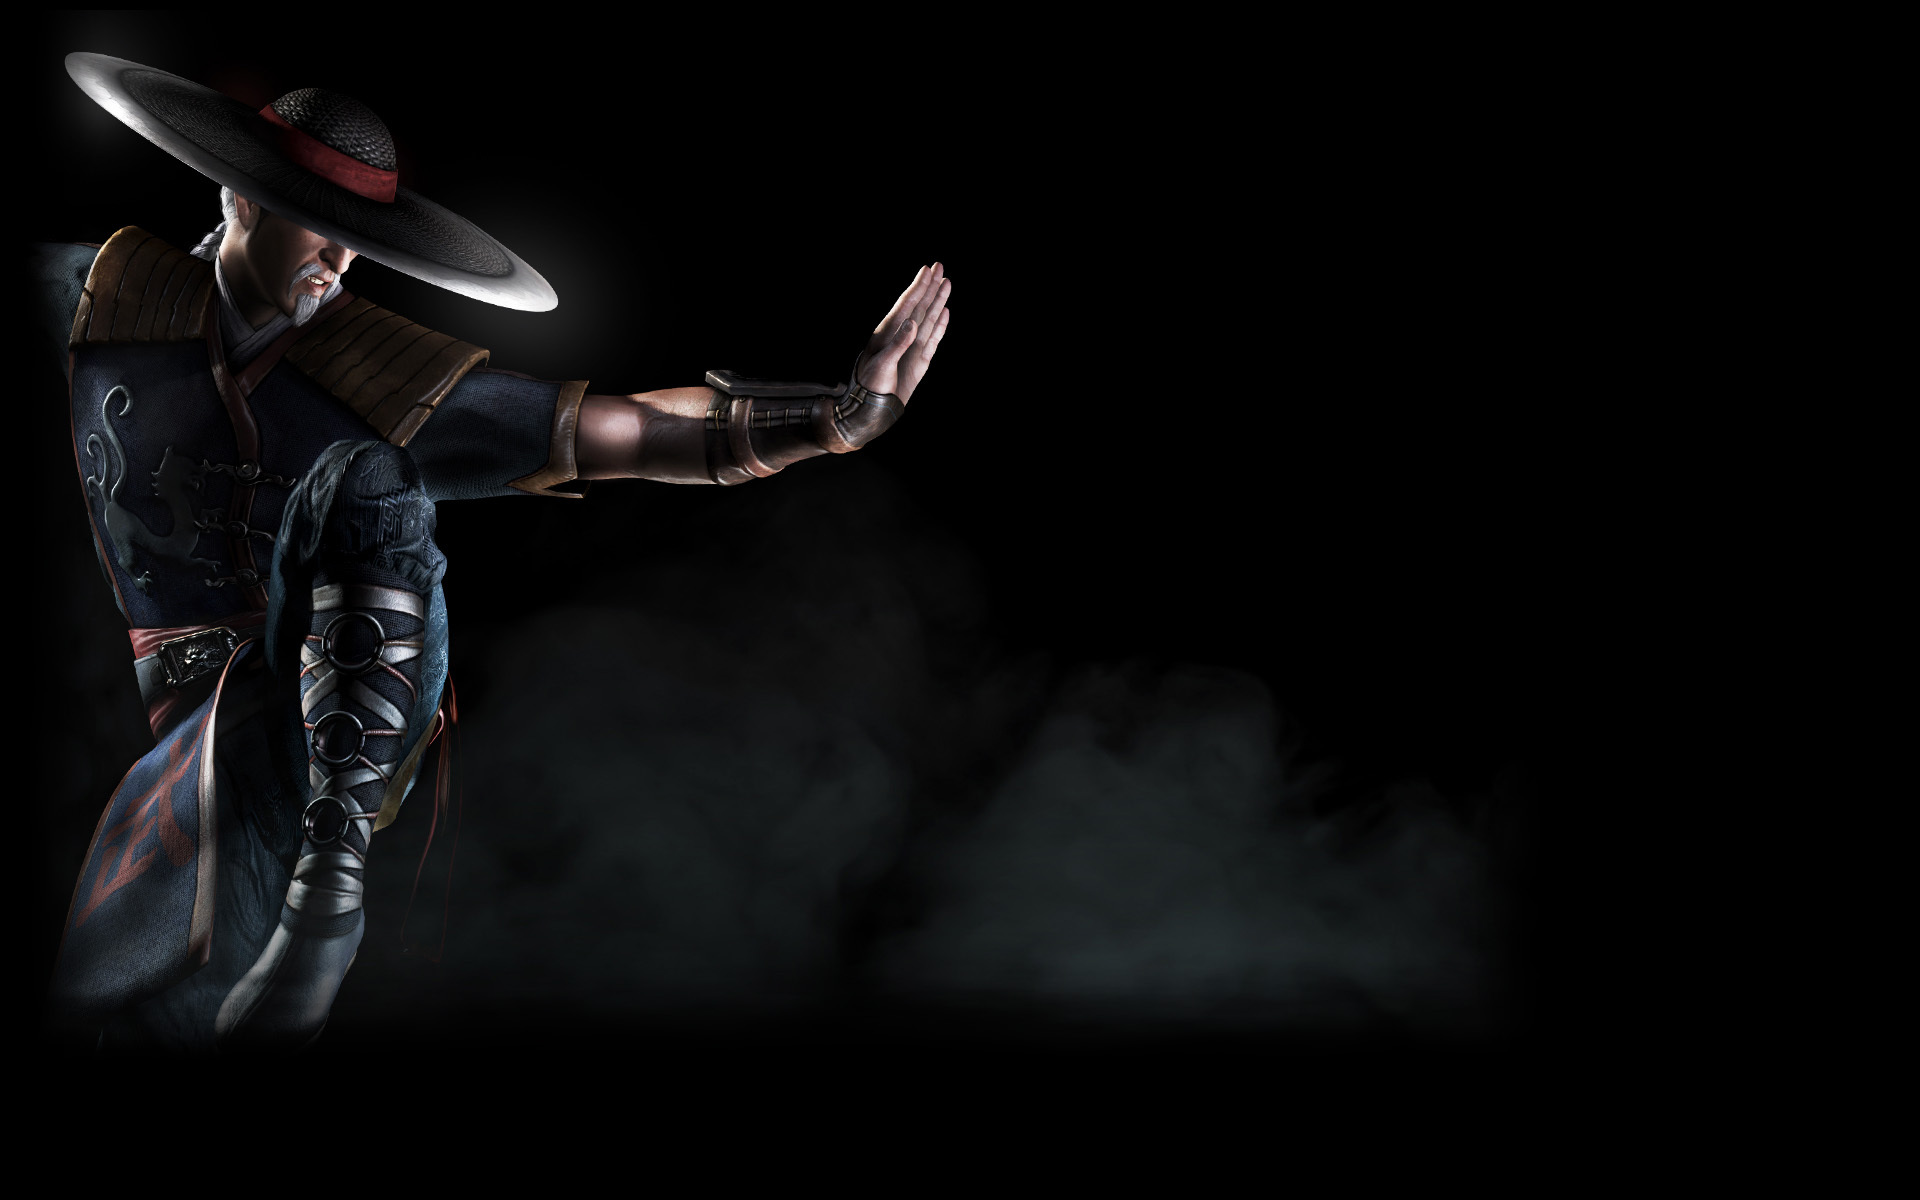 Background image 640 x 320 - Mortal Kombat X Background Kung Lao Jpg